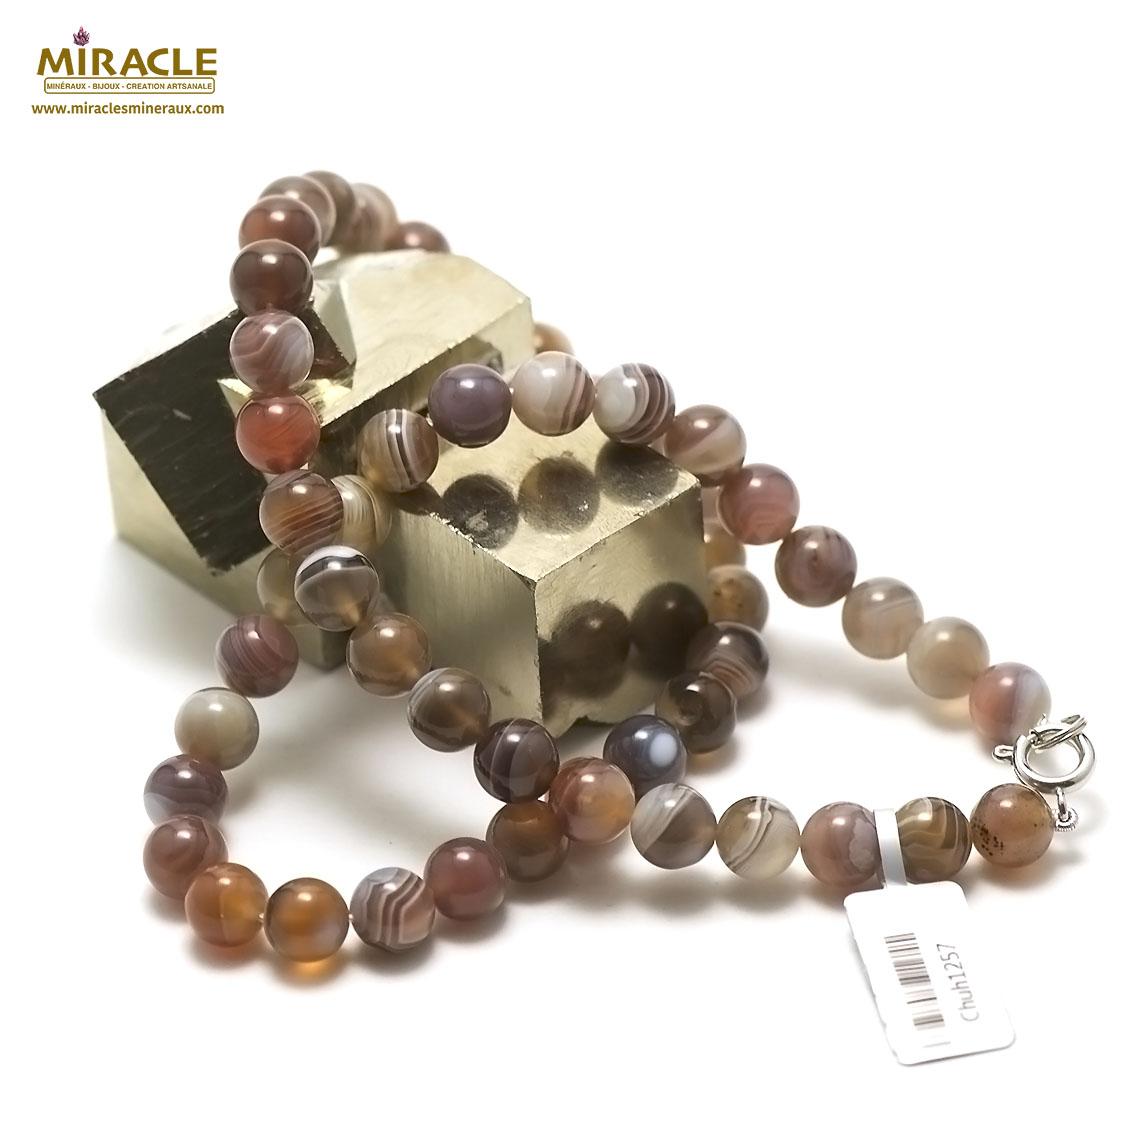 collier agate de Botwsana perle ronde 8 mm